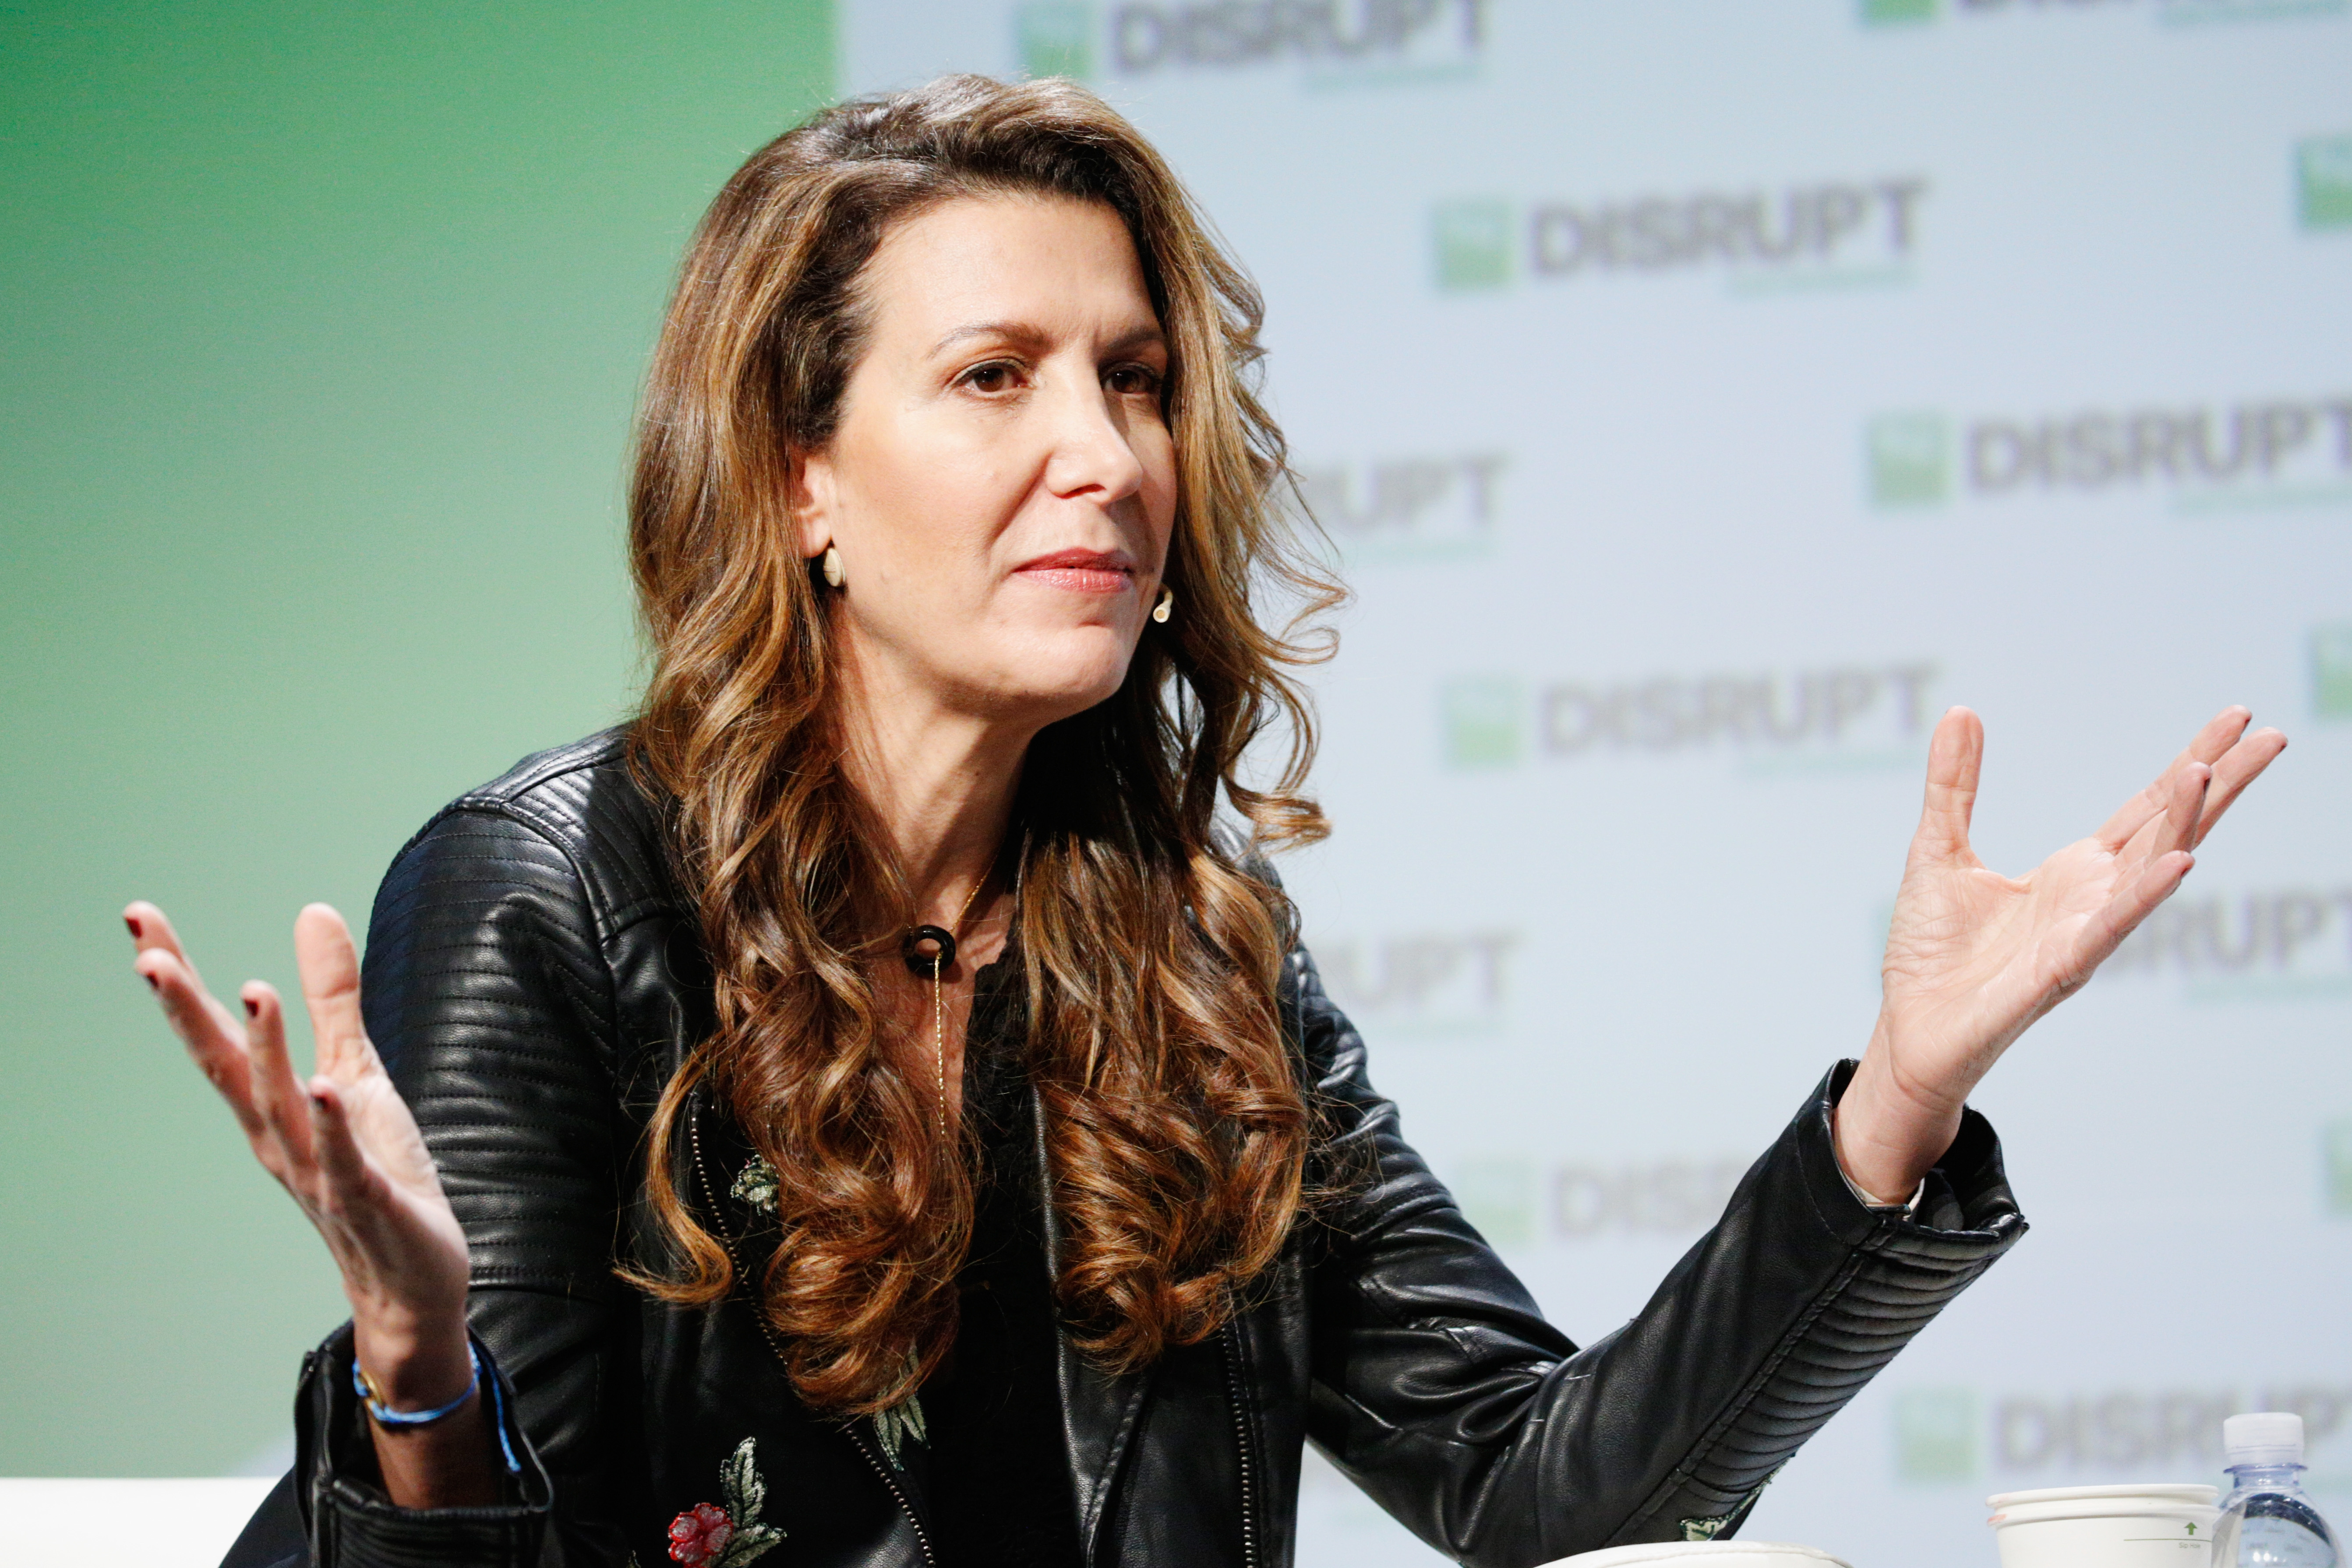 Brandless CEO Tina Sharkey onstage during TechCrunch Disrupt